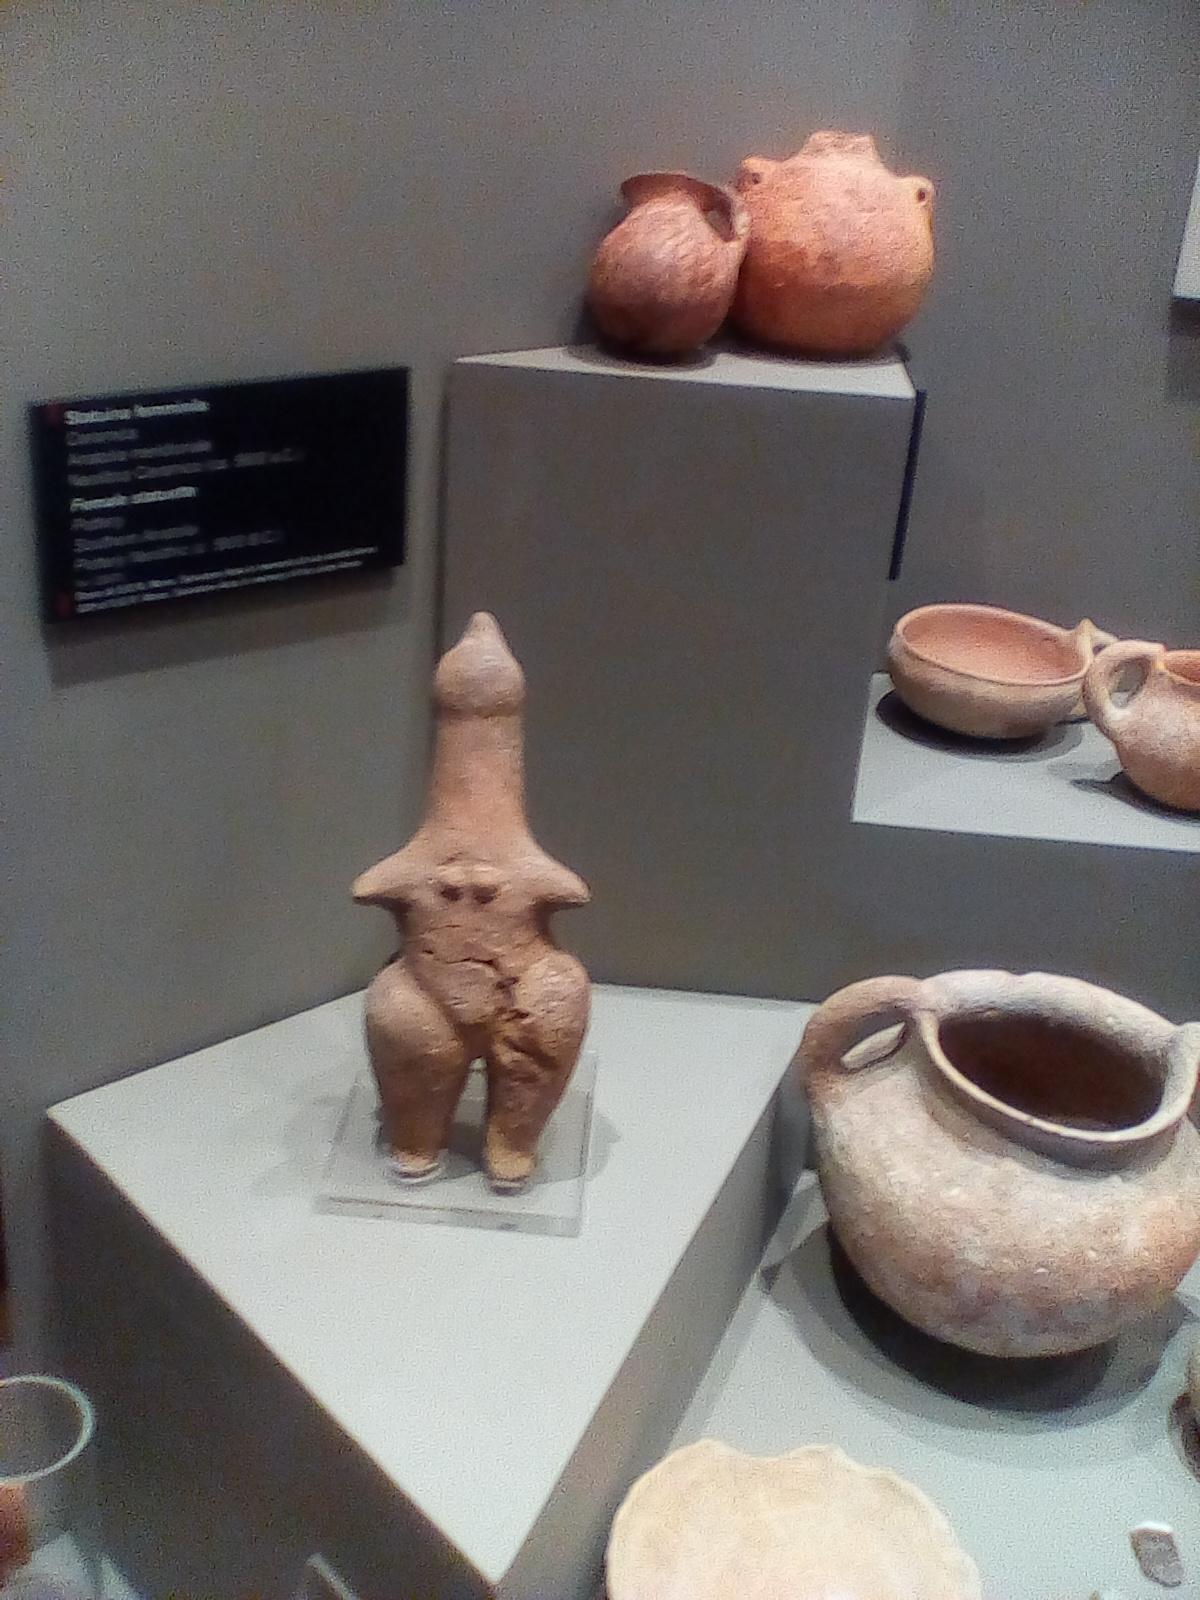 Penis shape human bodie wit human shape penis